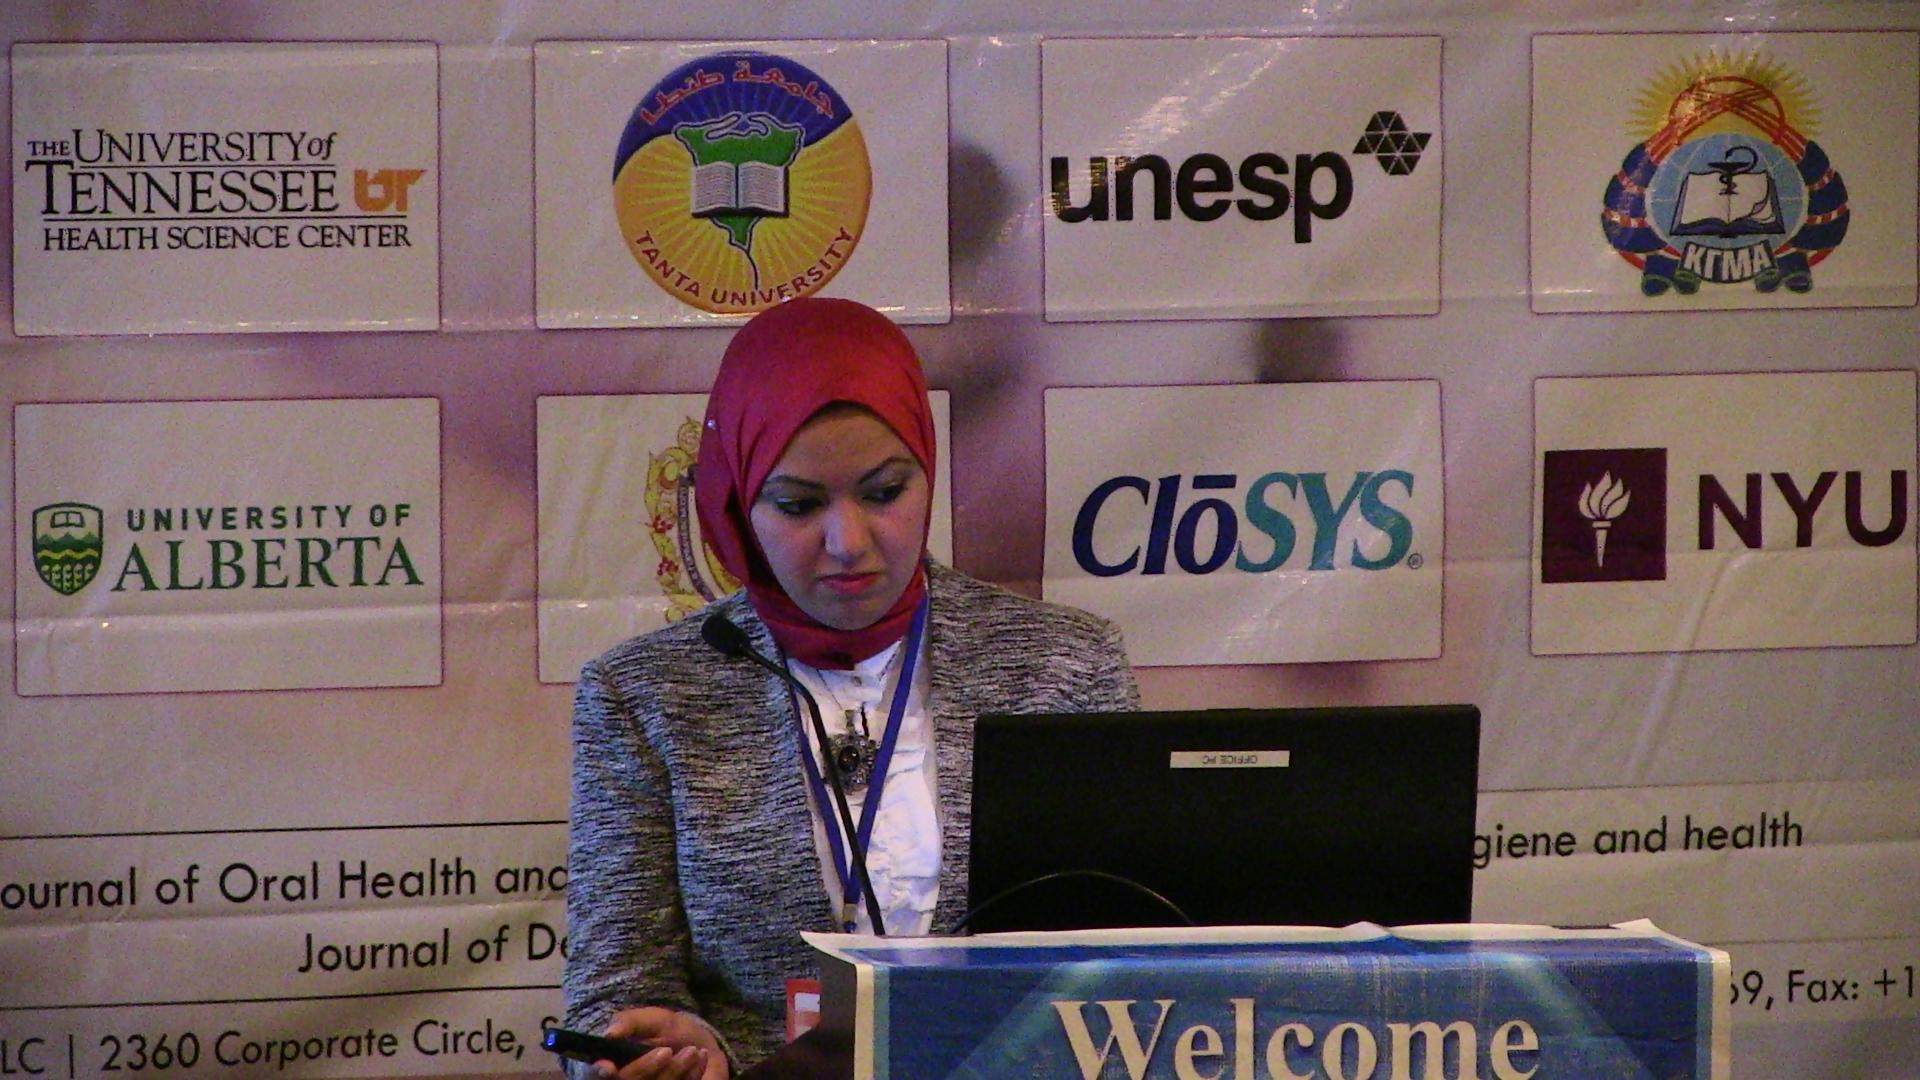 Radwa El-Dessouky